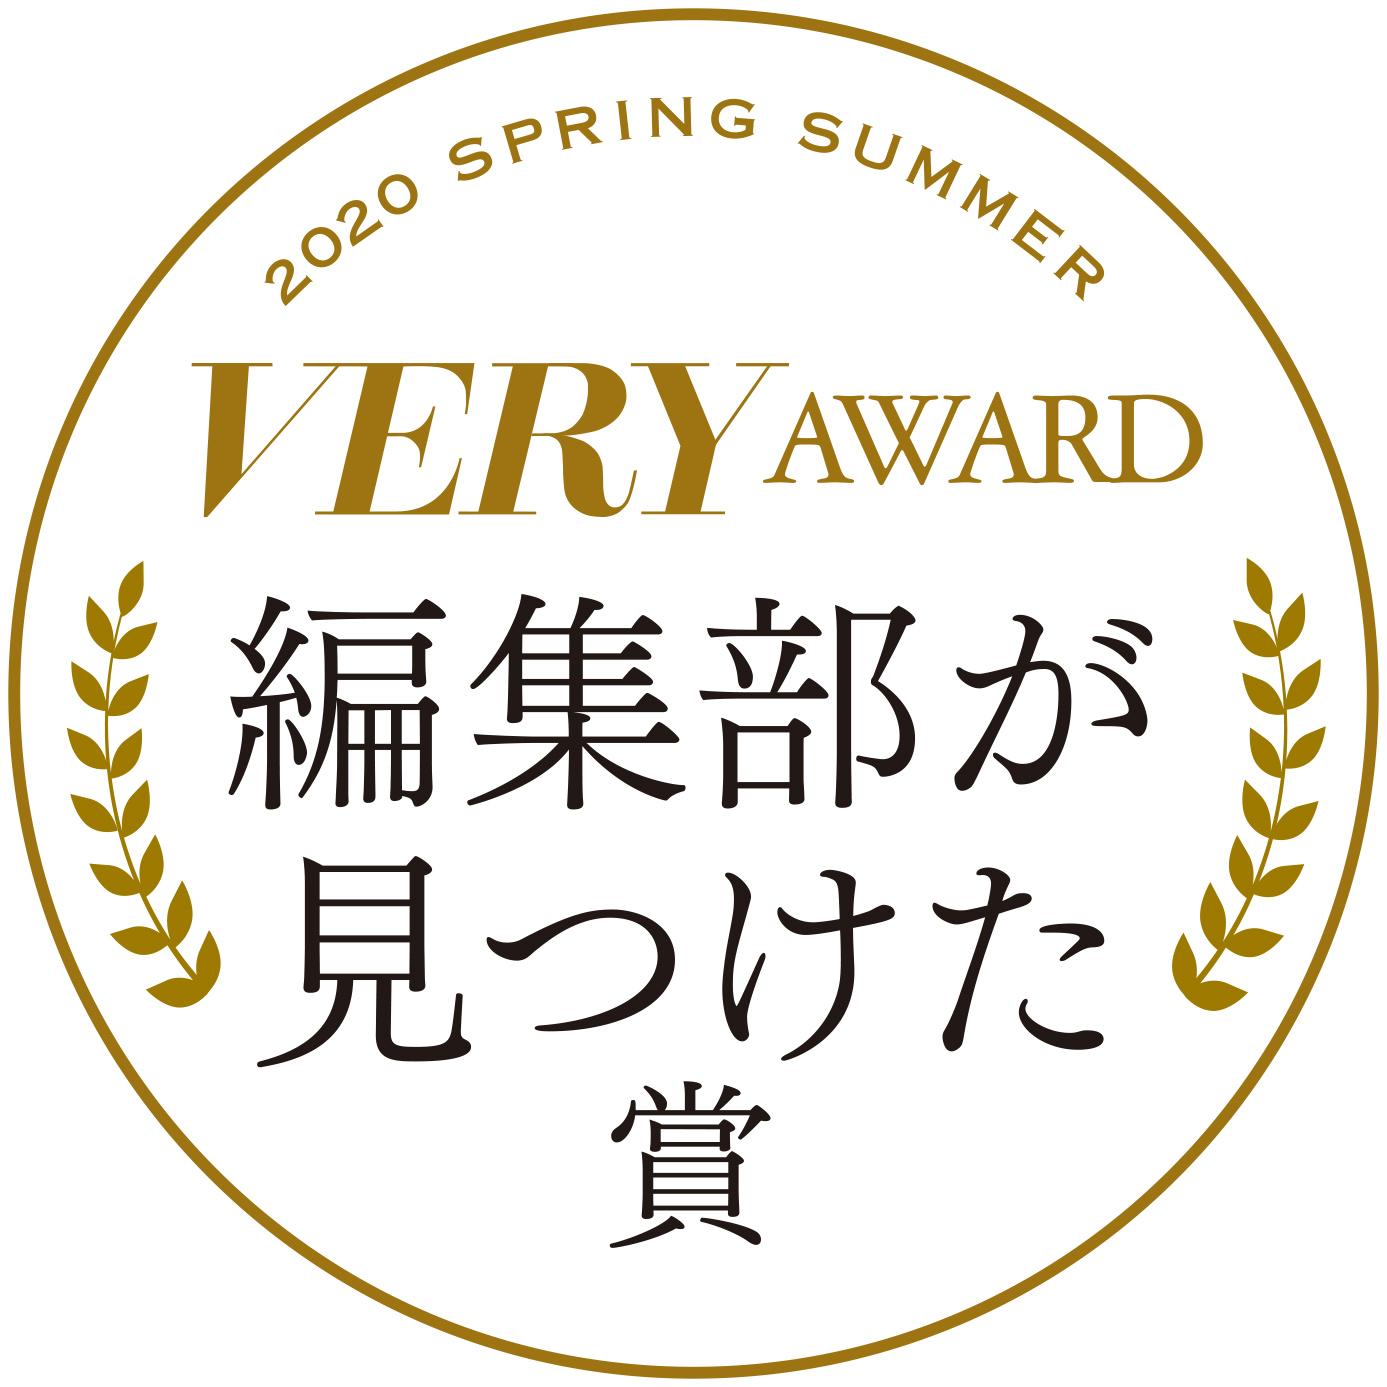 2020S/S VERY AWARD「編集部が見つけた賞」